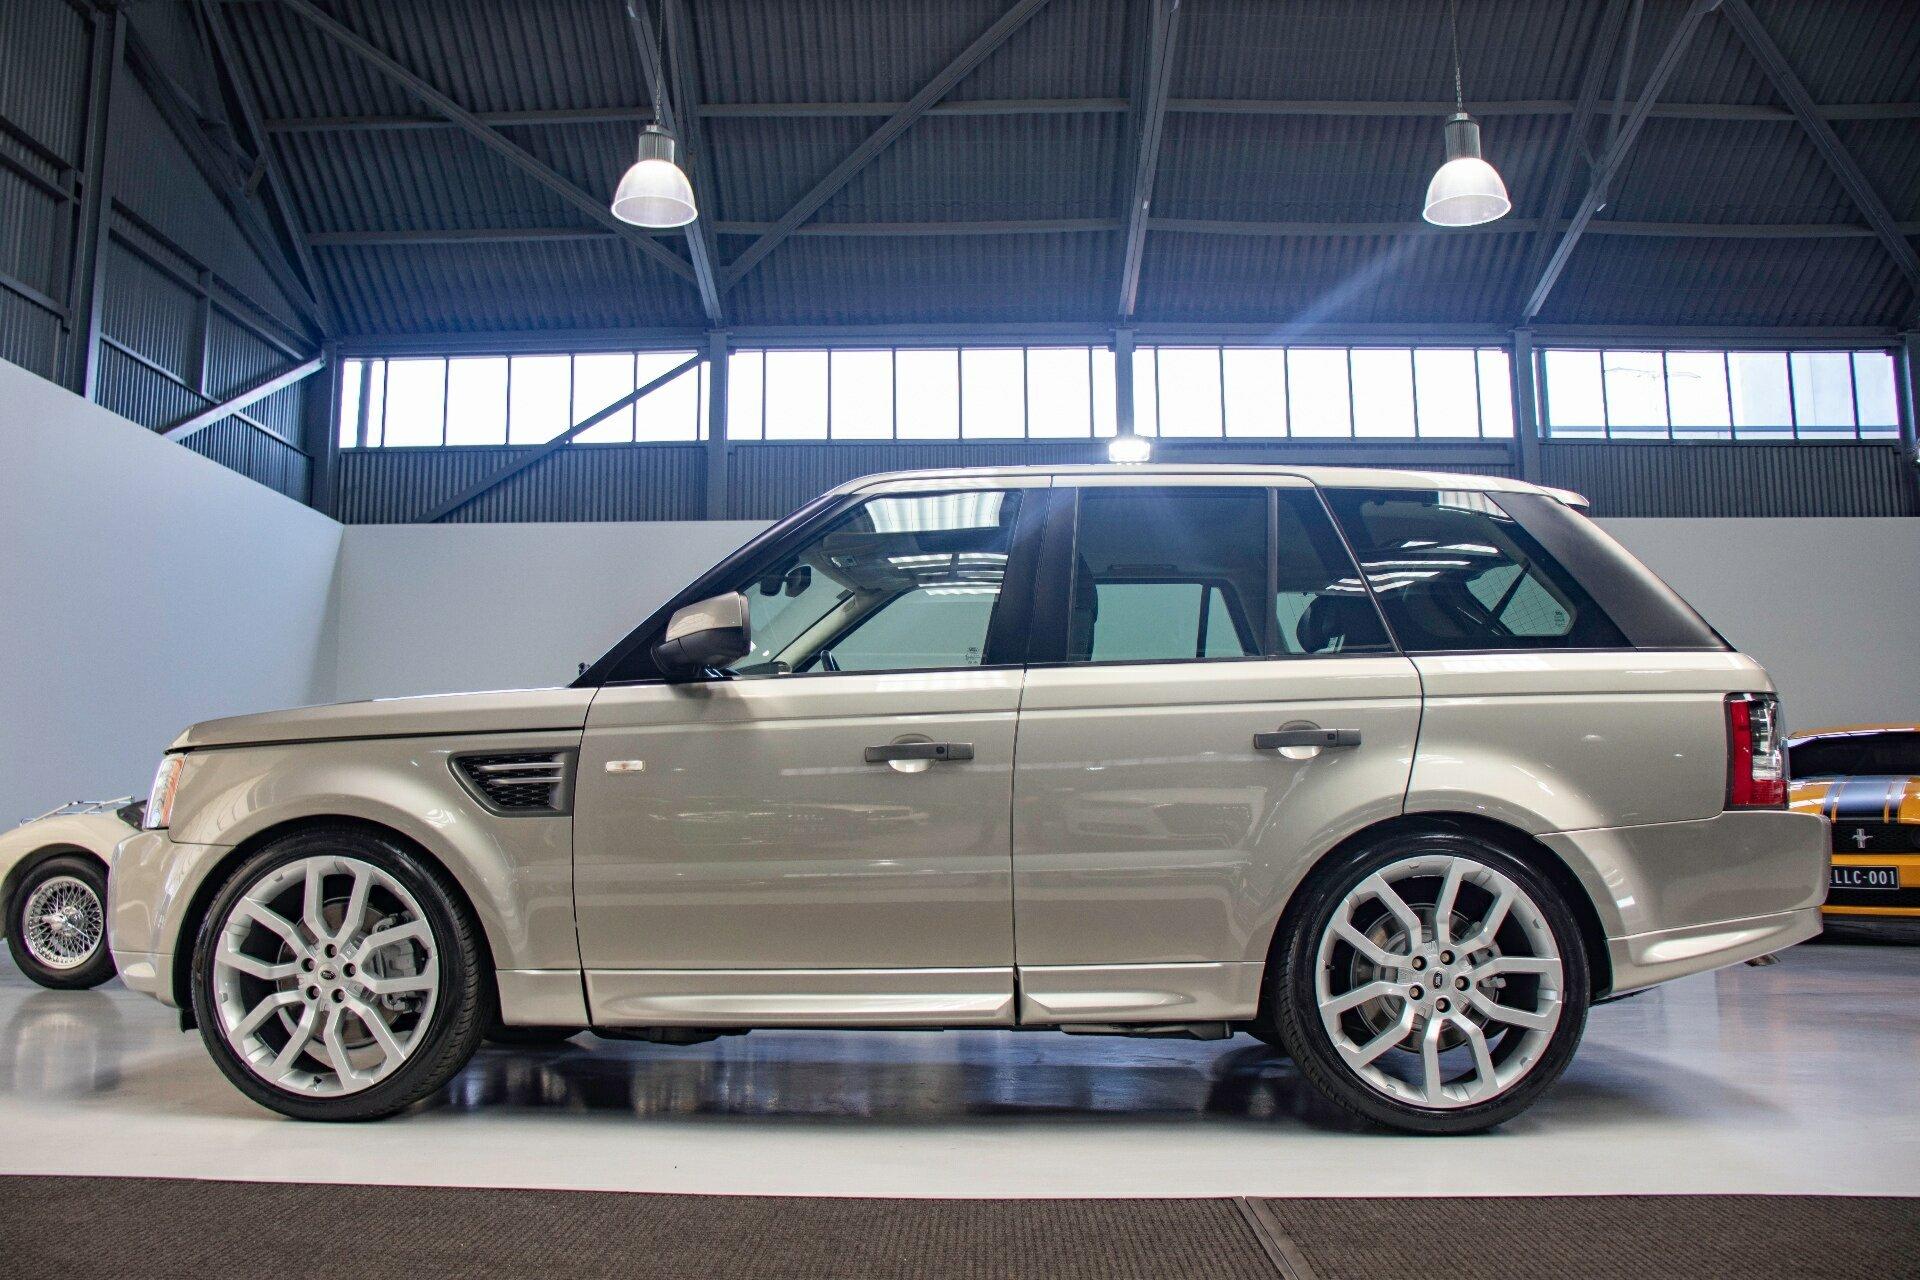 2011 Land Rover Range Rover Sport 3.0 Sdv6 Luxury My12